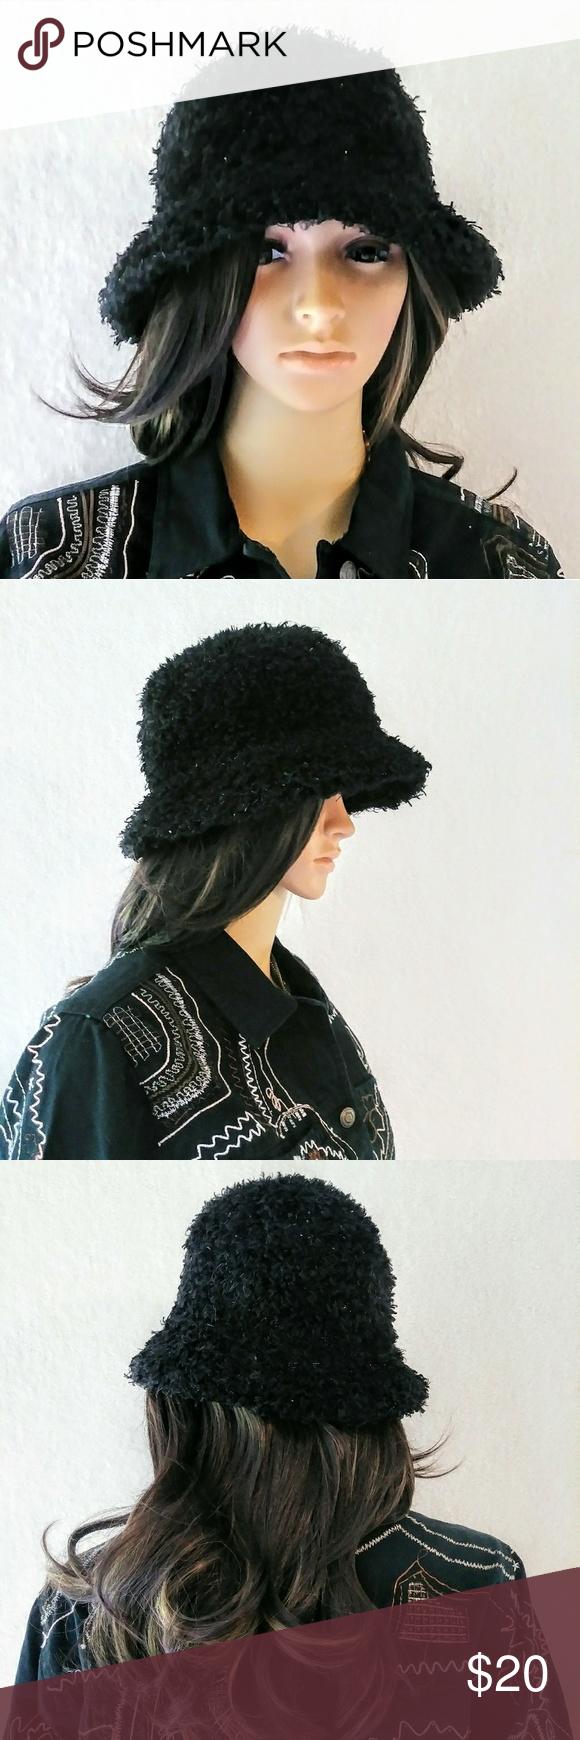 I just added this listing on Poshmark  Cejon Black Shaggy Sparkly Bucket Hat.   shopmycloset  poshmark  fashion  shopping  style  forsale  Cejon   Accessories 07d822f25da